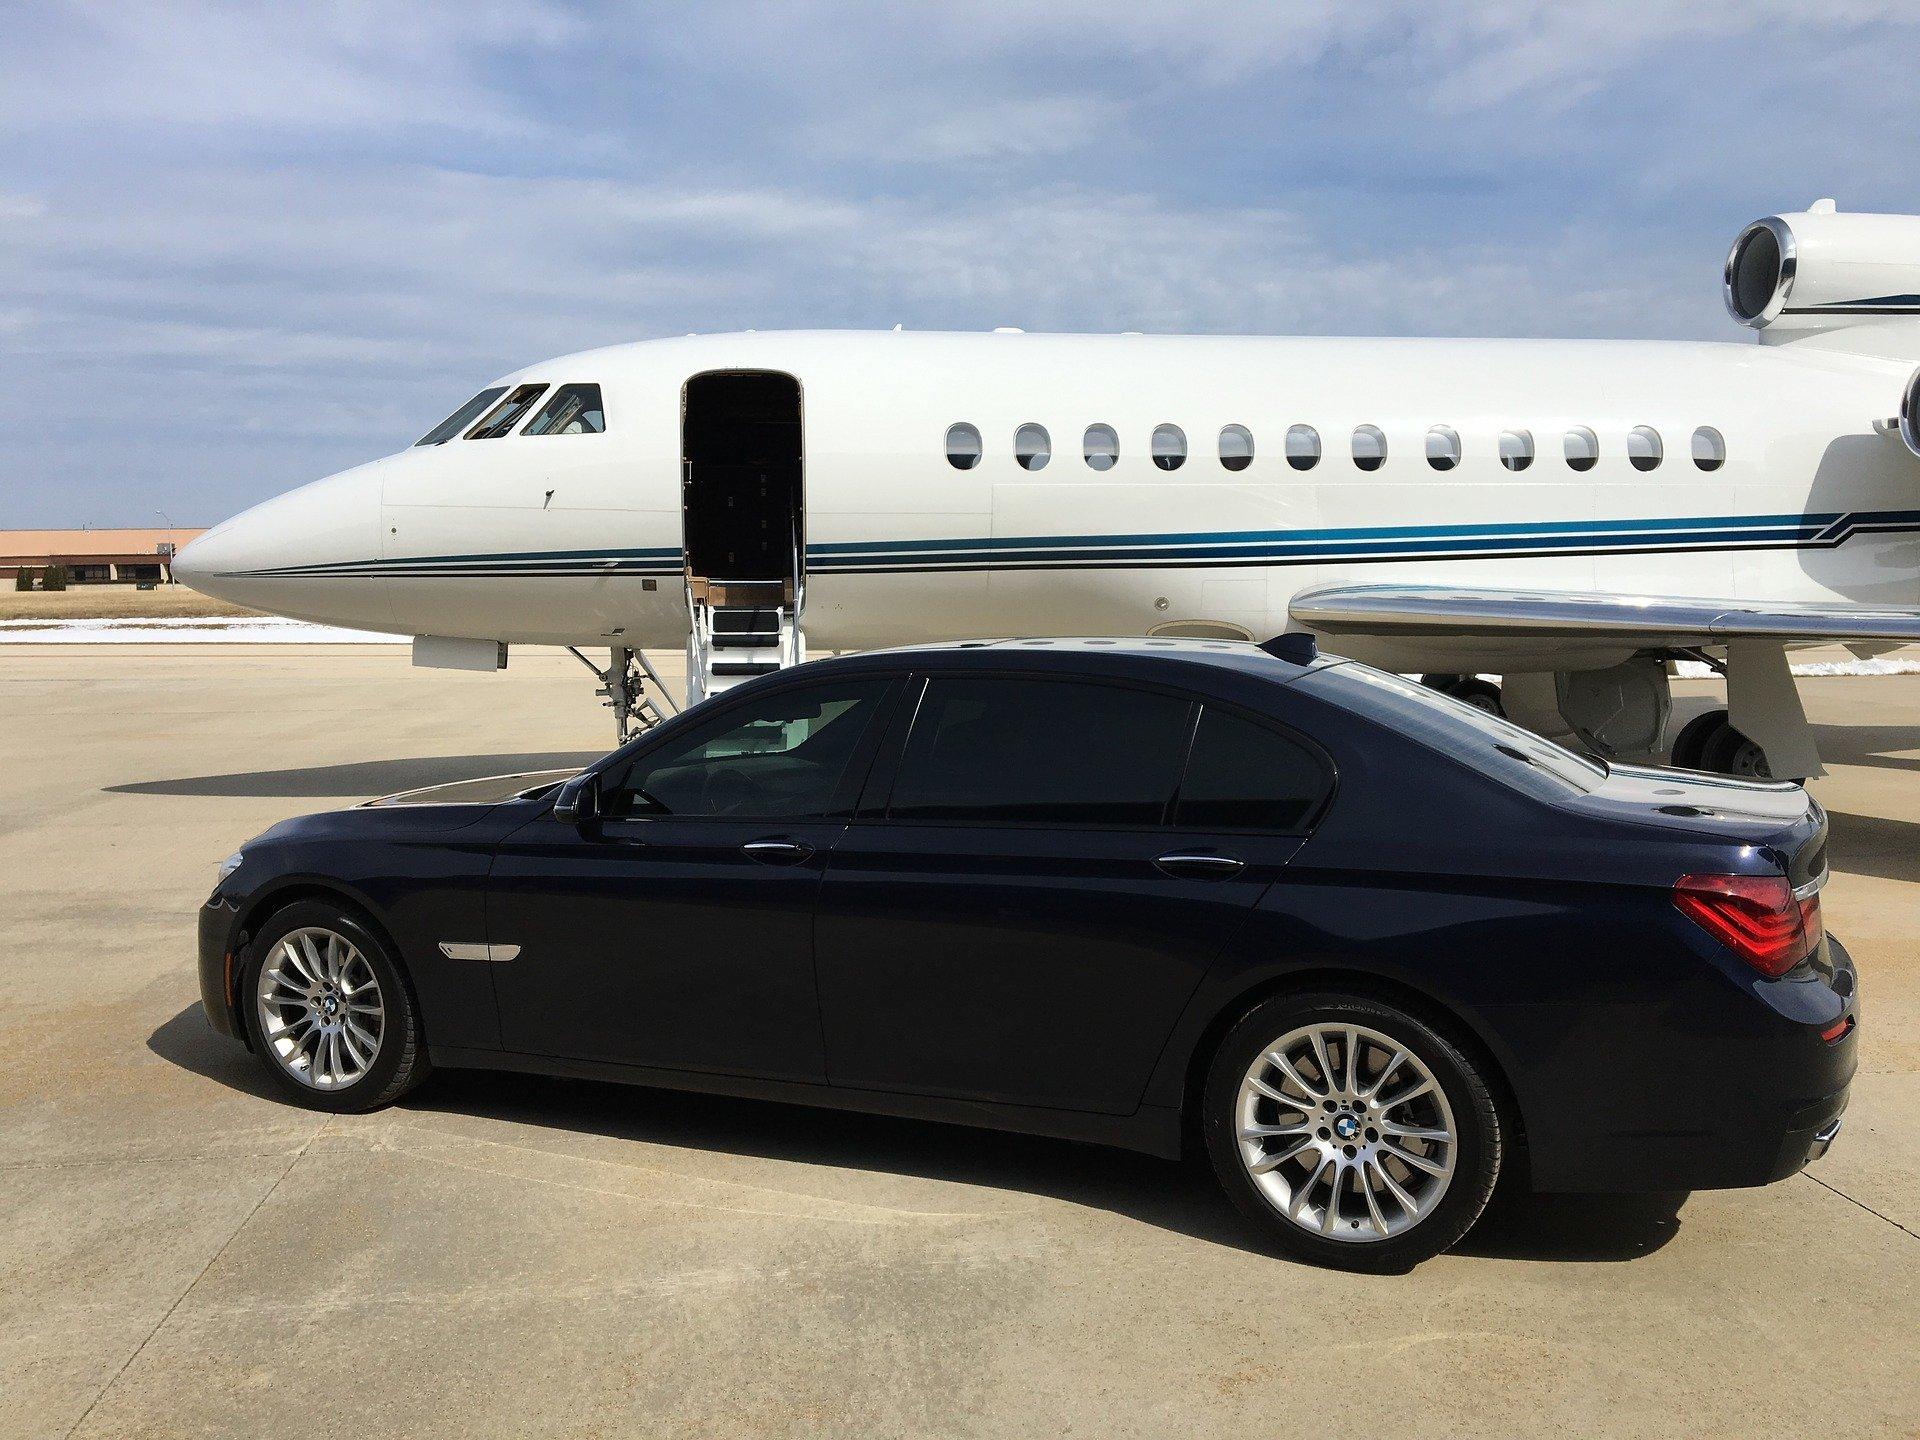 Luxury Air Transfer